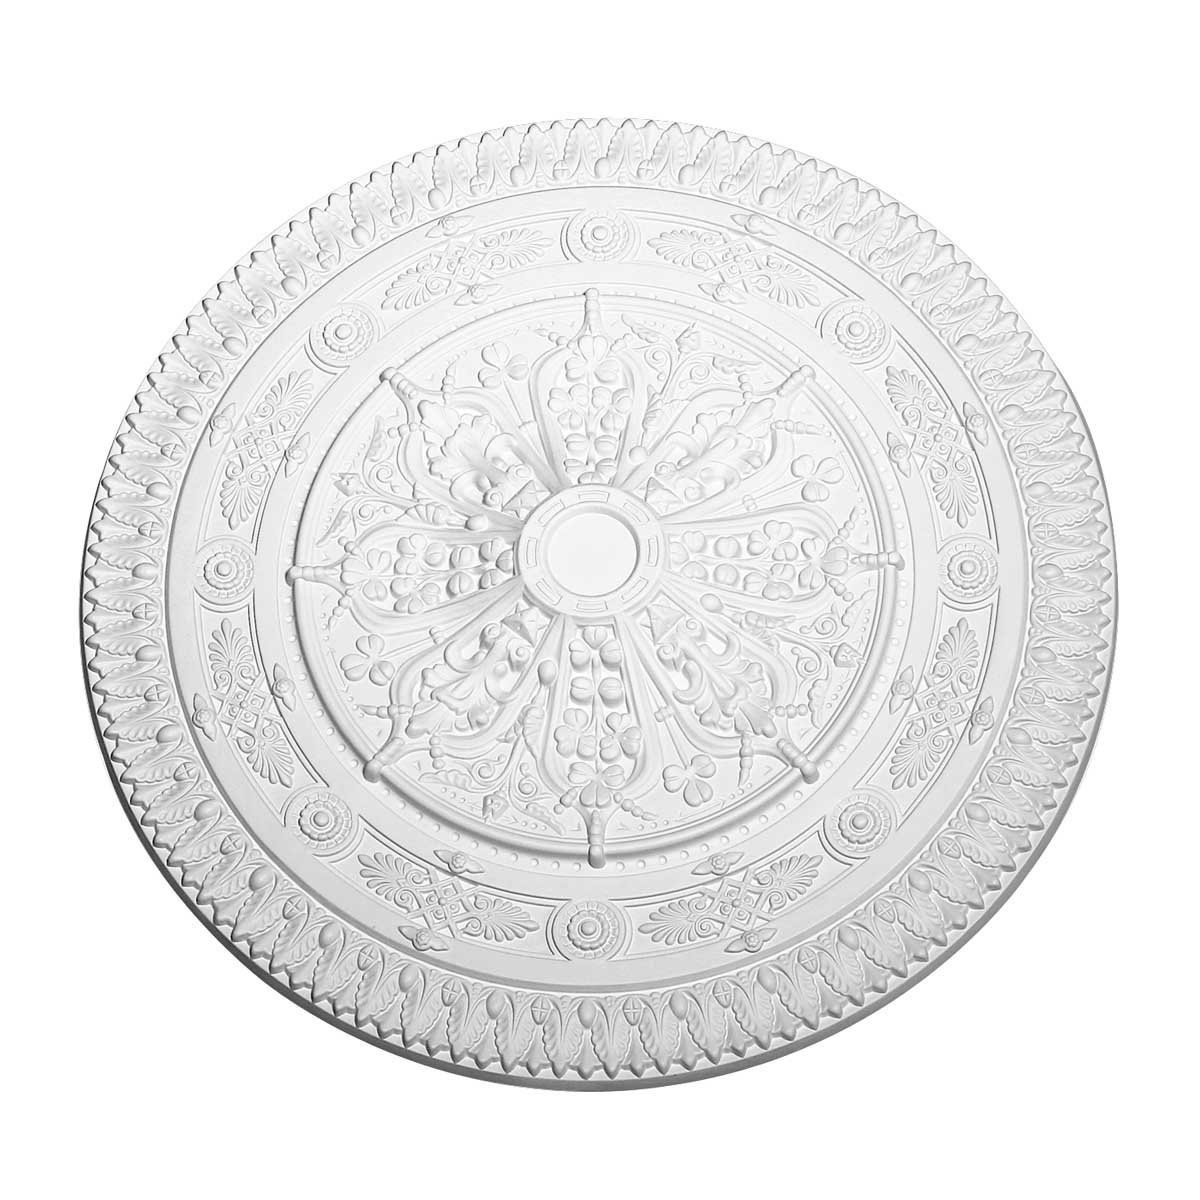 Ceiling Medallions White Urethane Ceiling Medallion 38'' Dia by Renovator's Supply